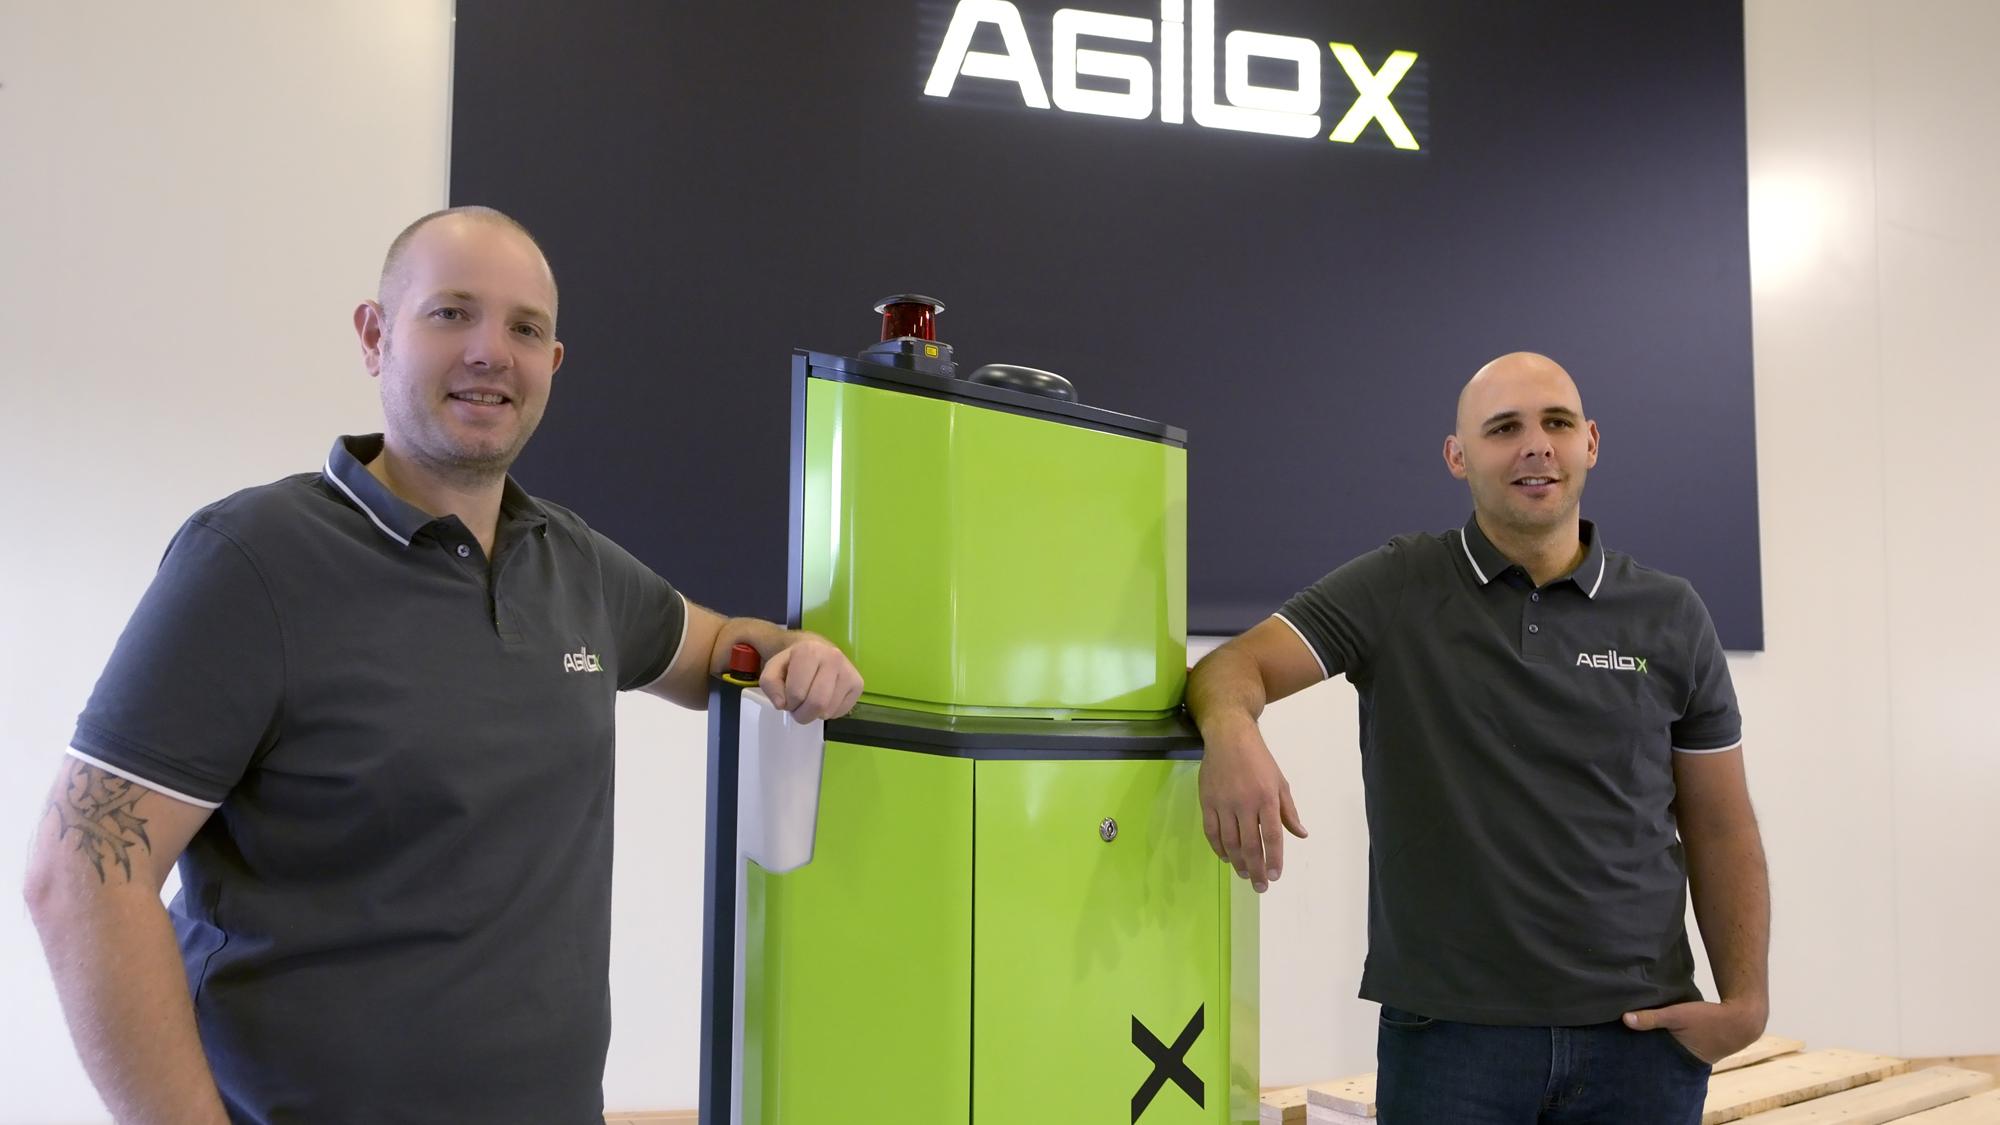 Die beiden Agilox-CEOs © AGILOX Systems GmbH, David Katouly